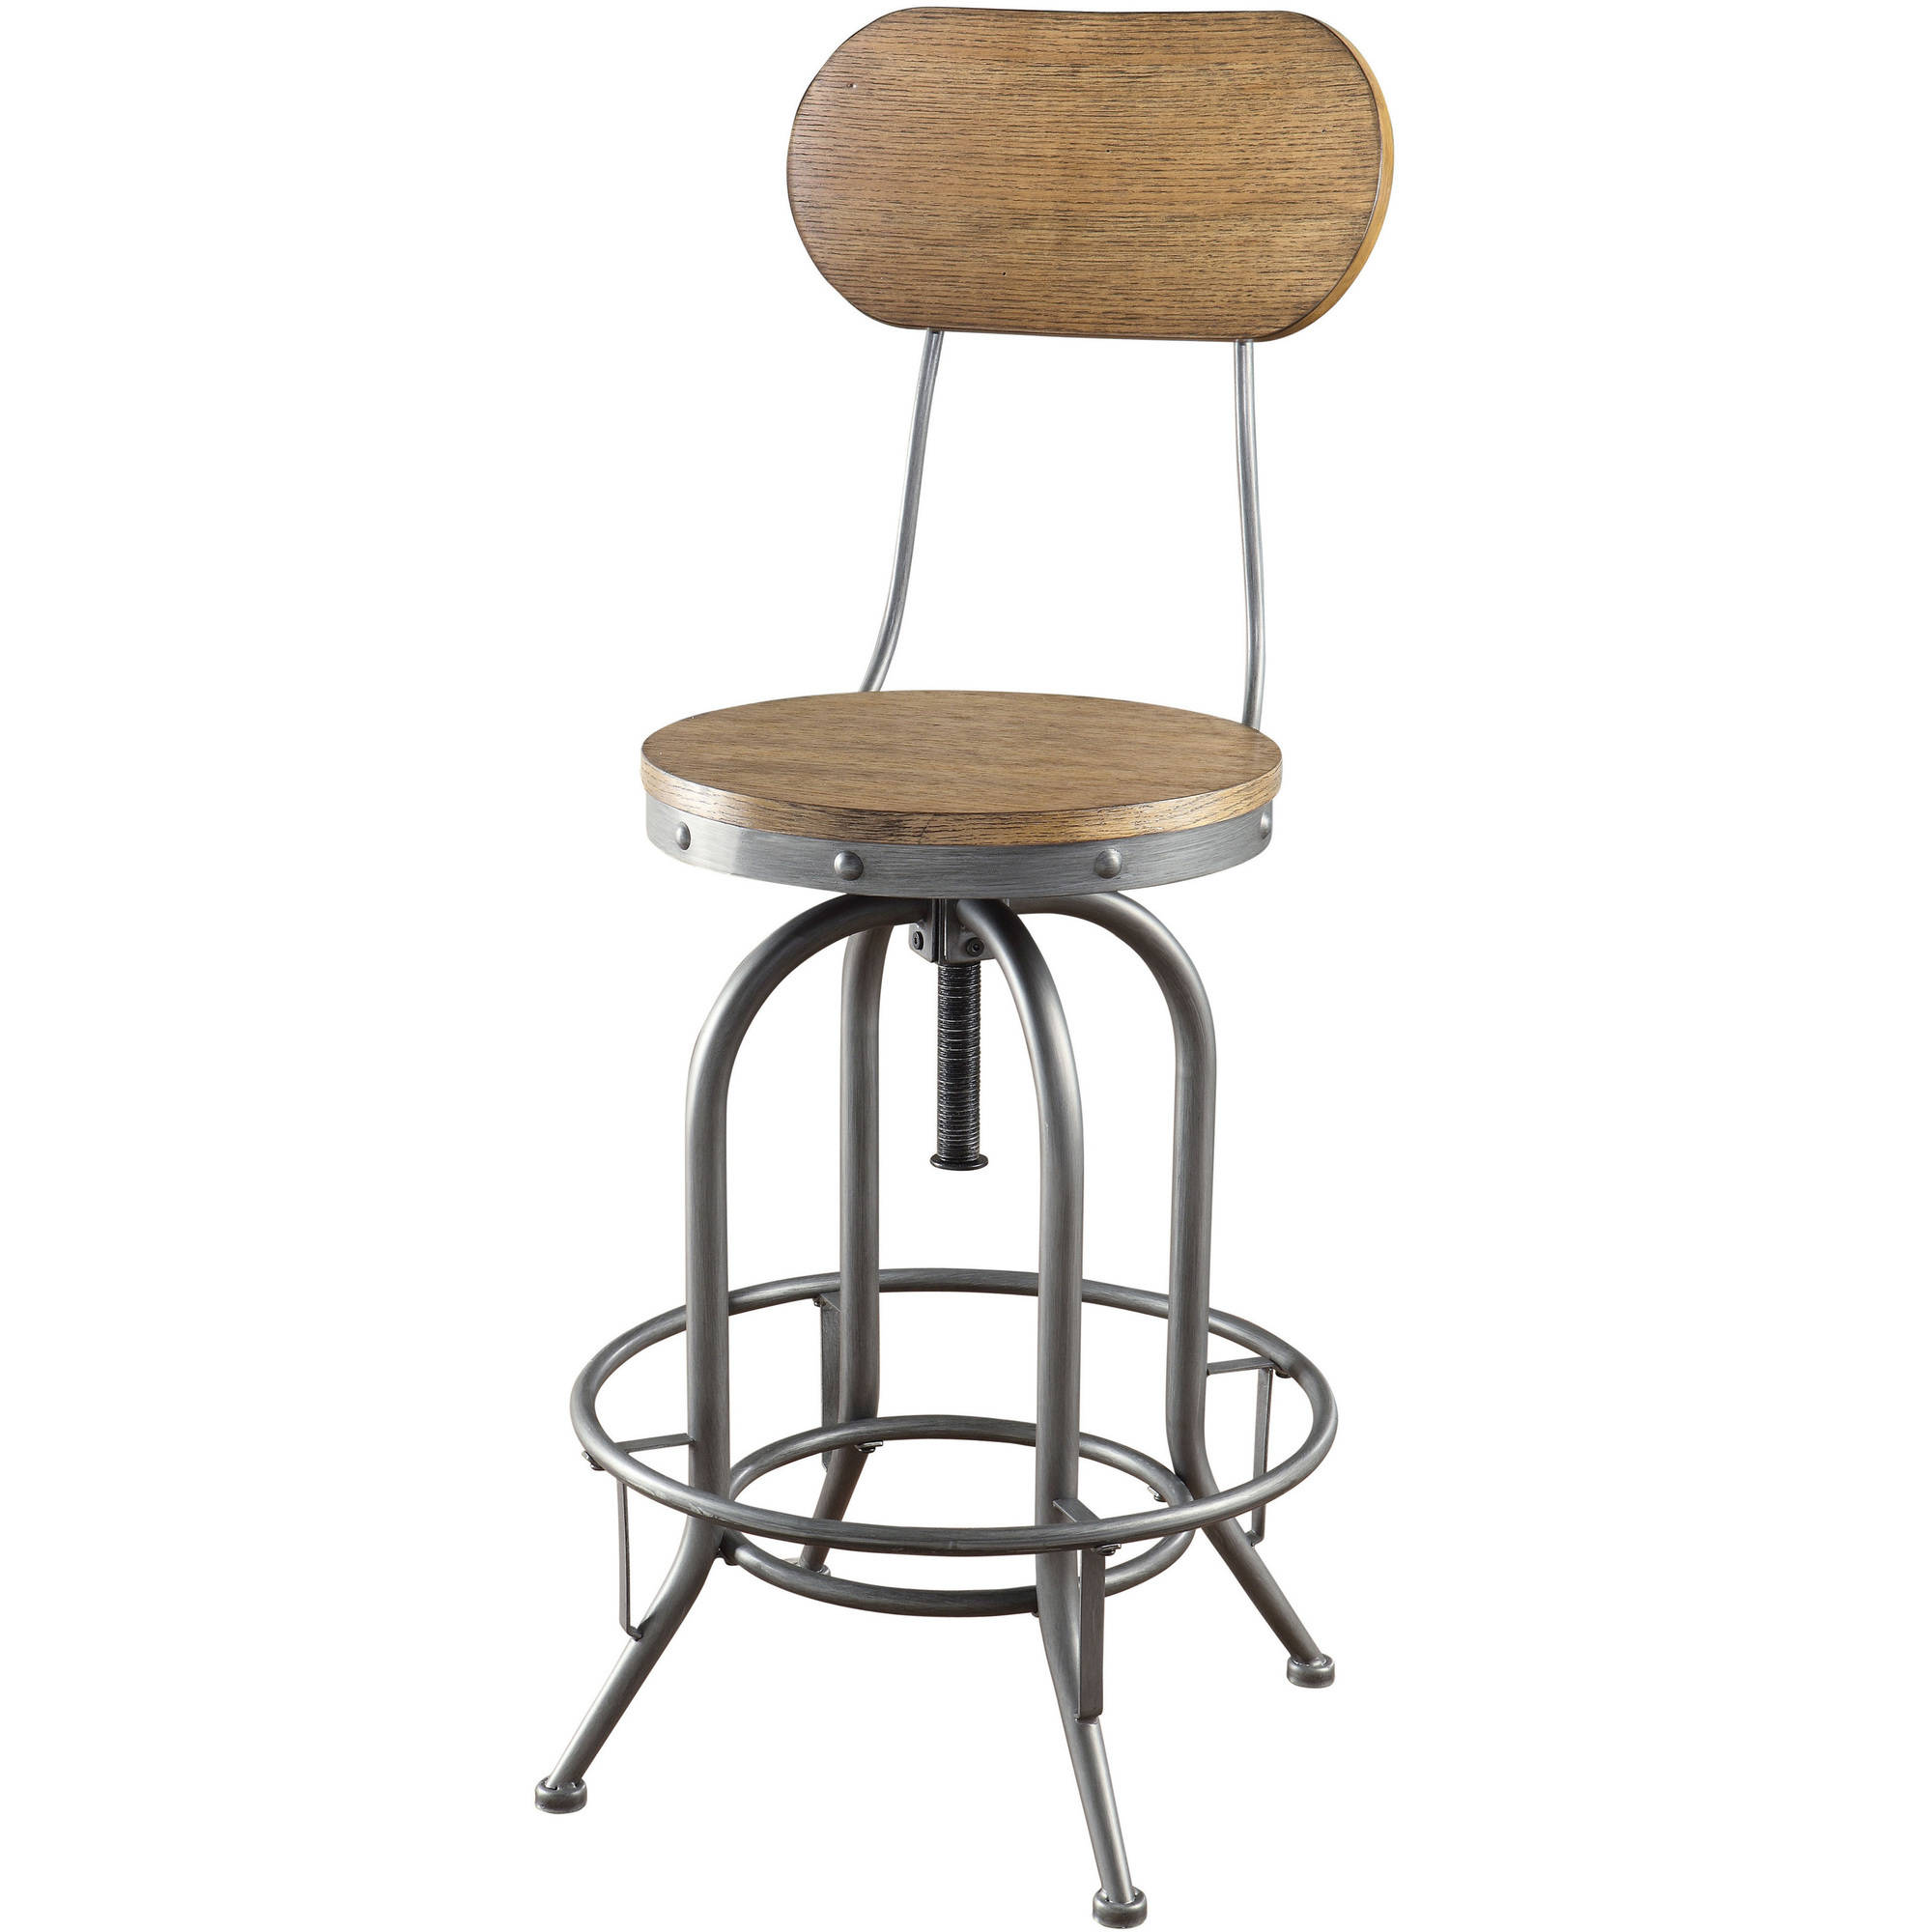 Coaster Company Adjustable Bar Stool, Weathered Brown